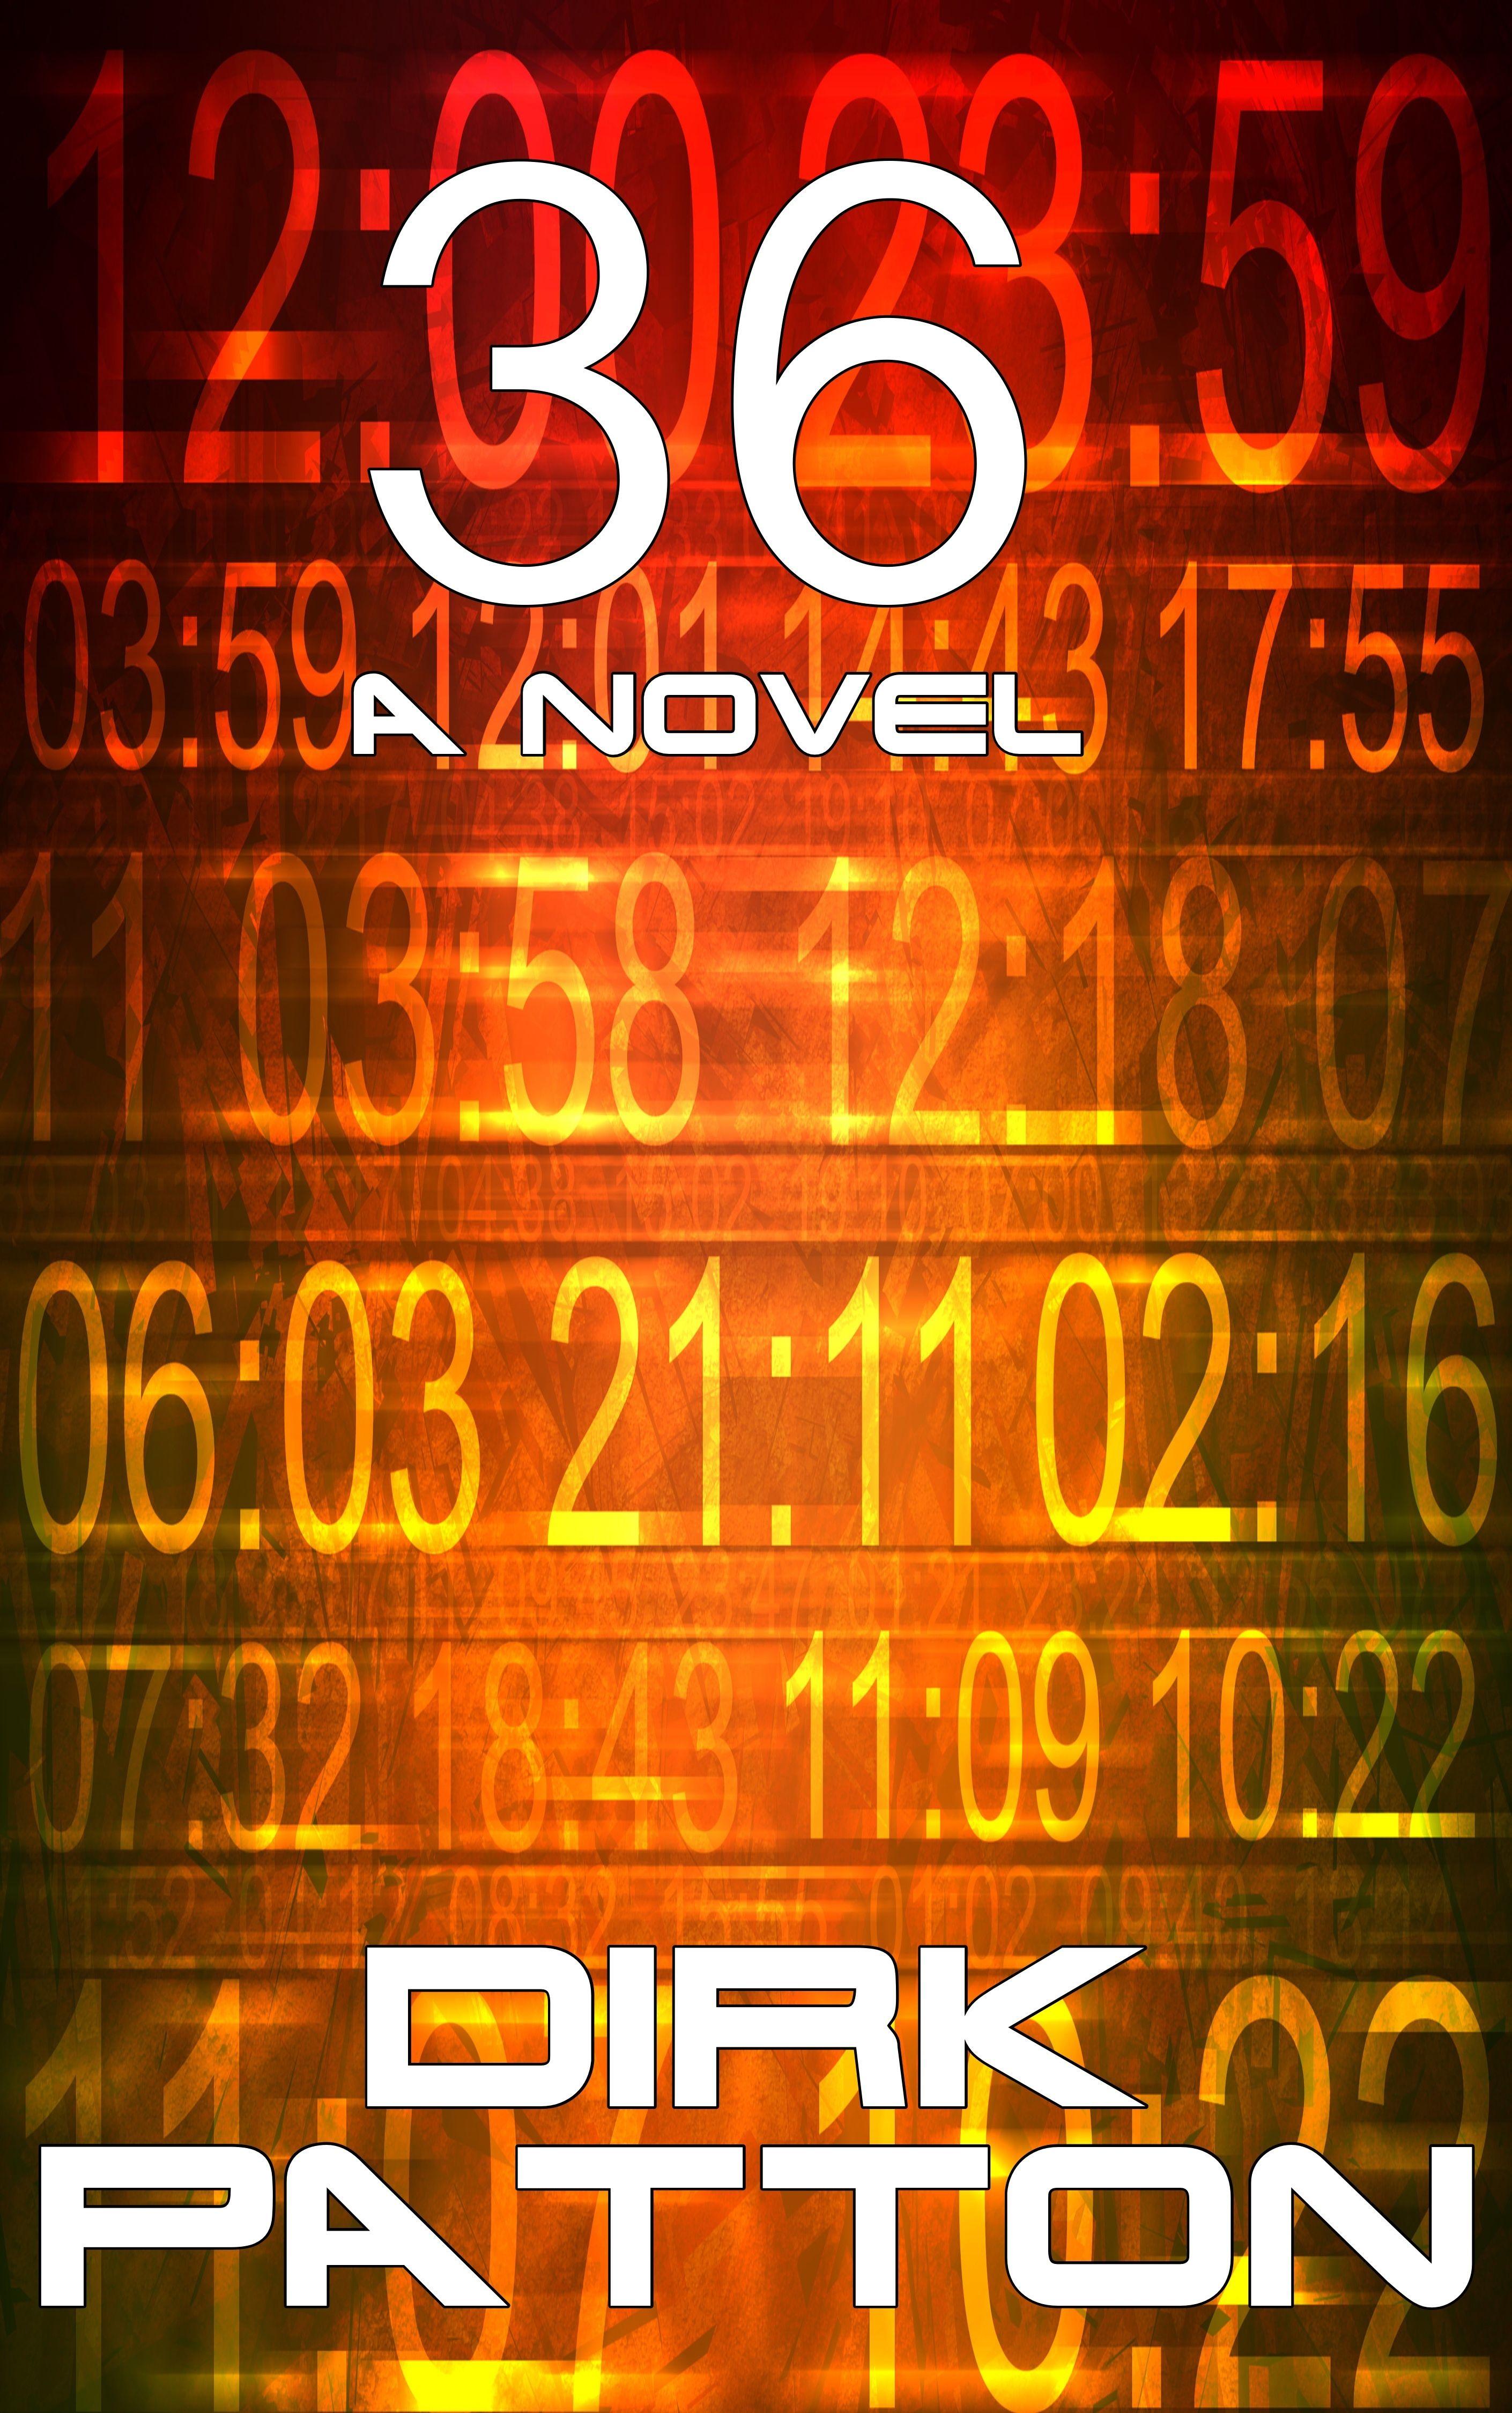 Dirk patton 36 novels novels worth reading political